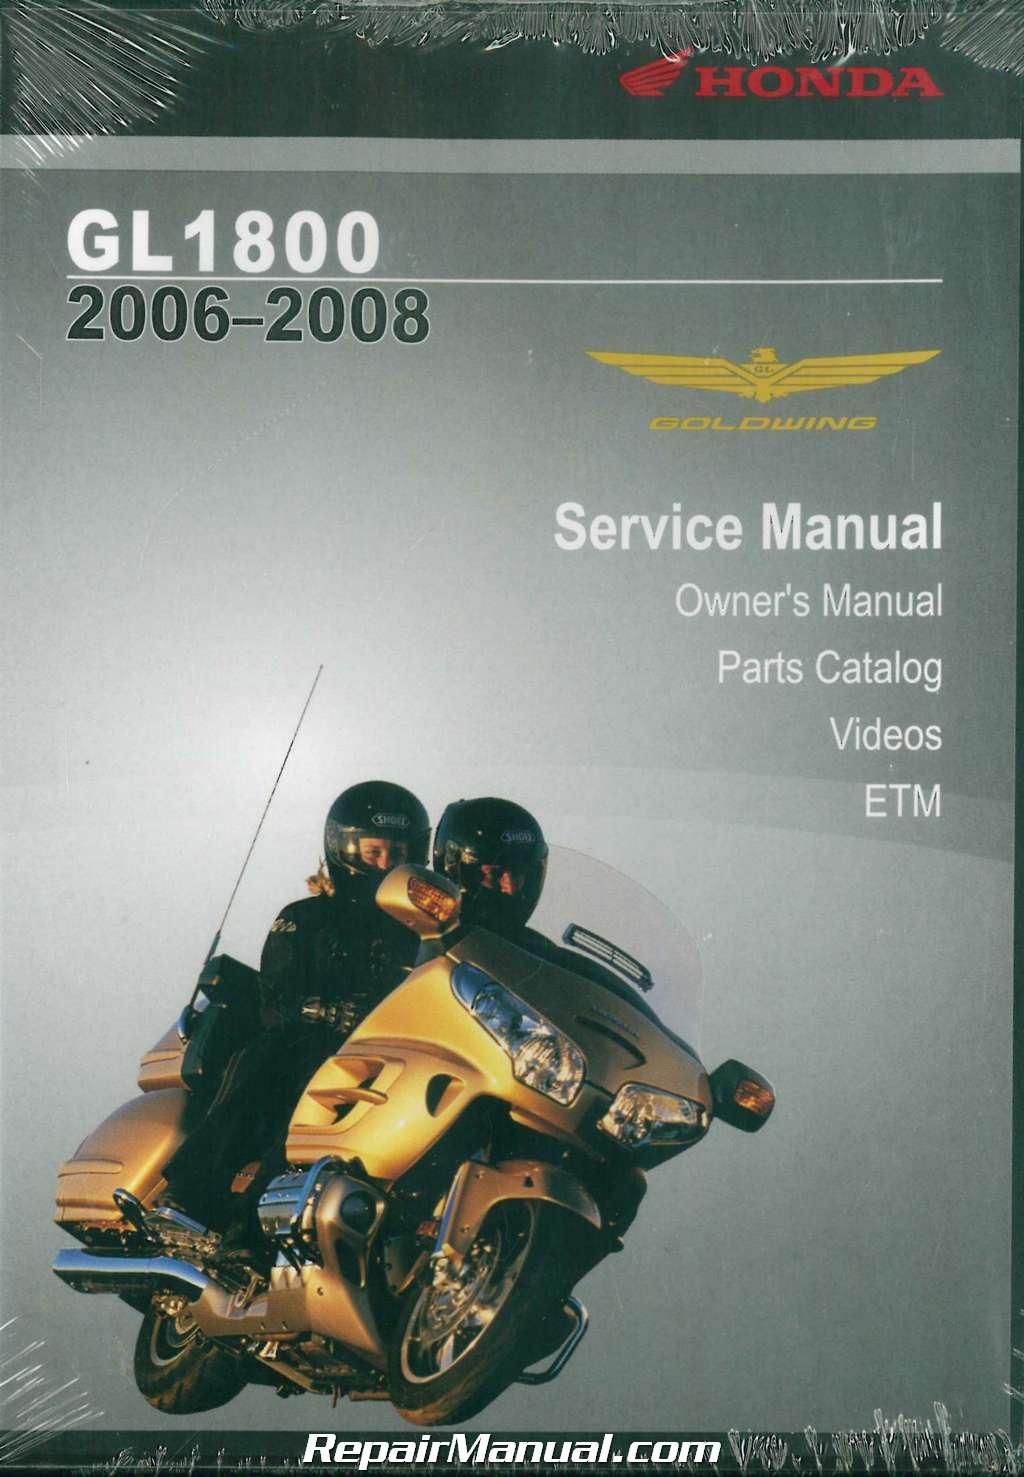 2006 2008 honda gl1800 gold wing service manual dvd rh repairmanual com 2008 honda goldwing owners manual 2006 goldwing owners manual